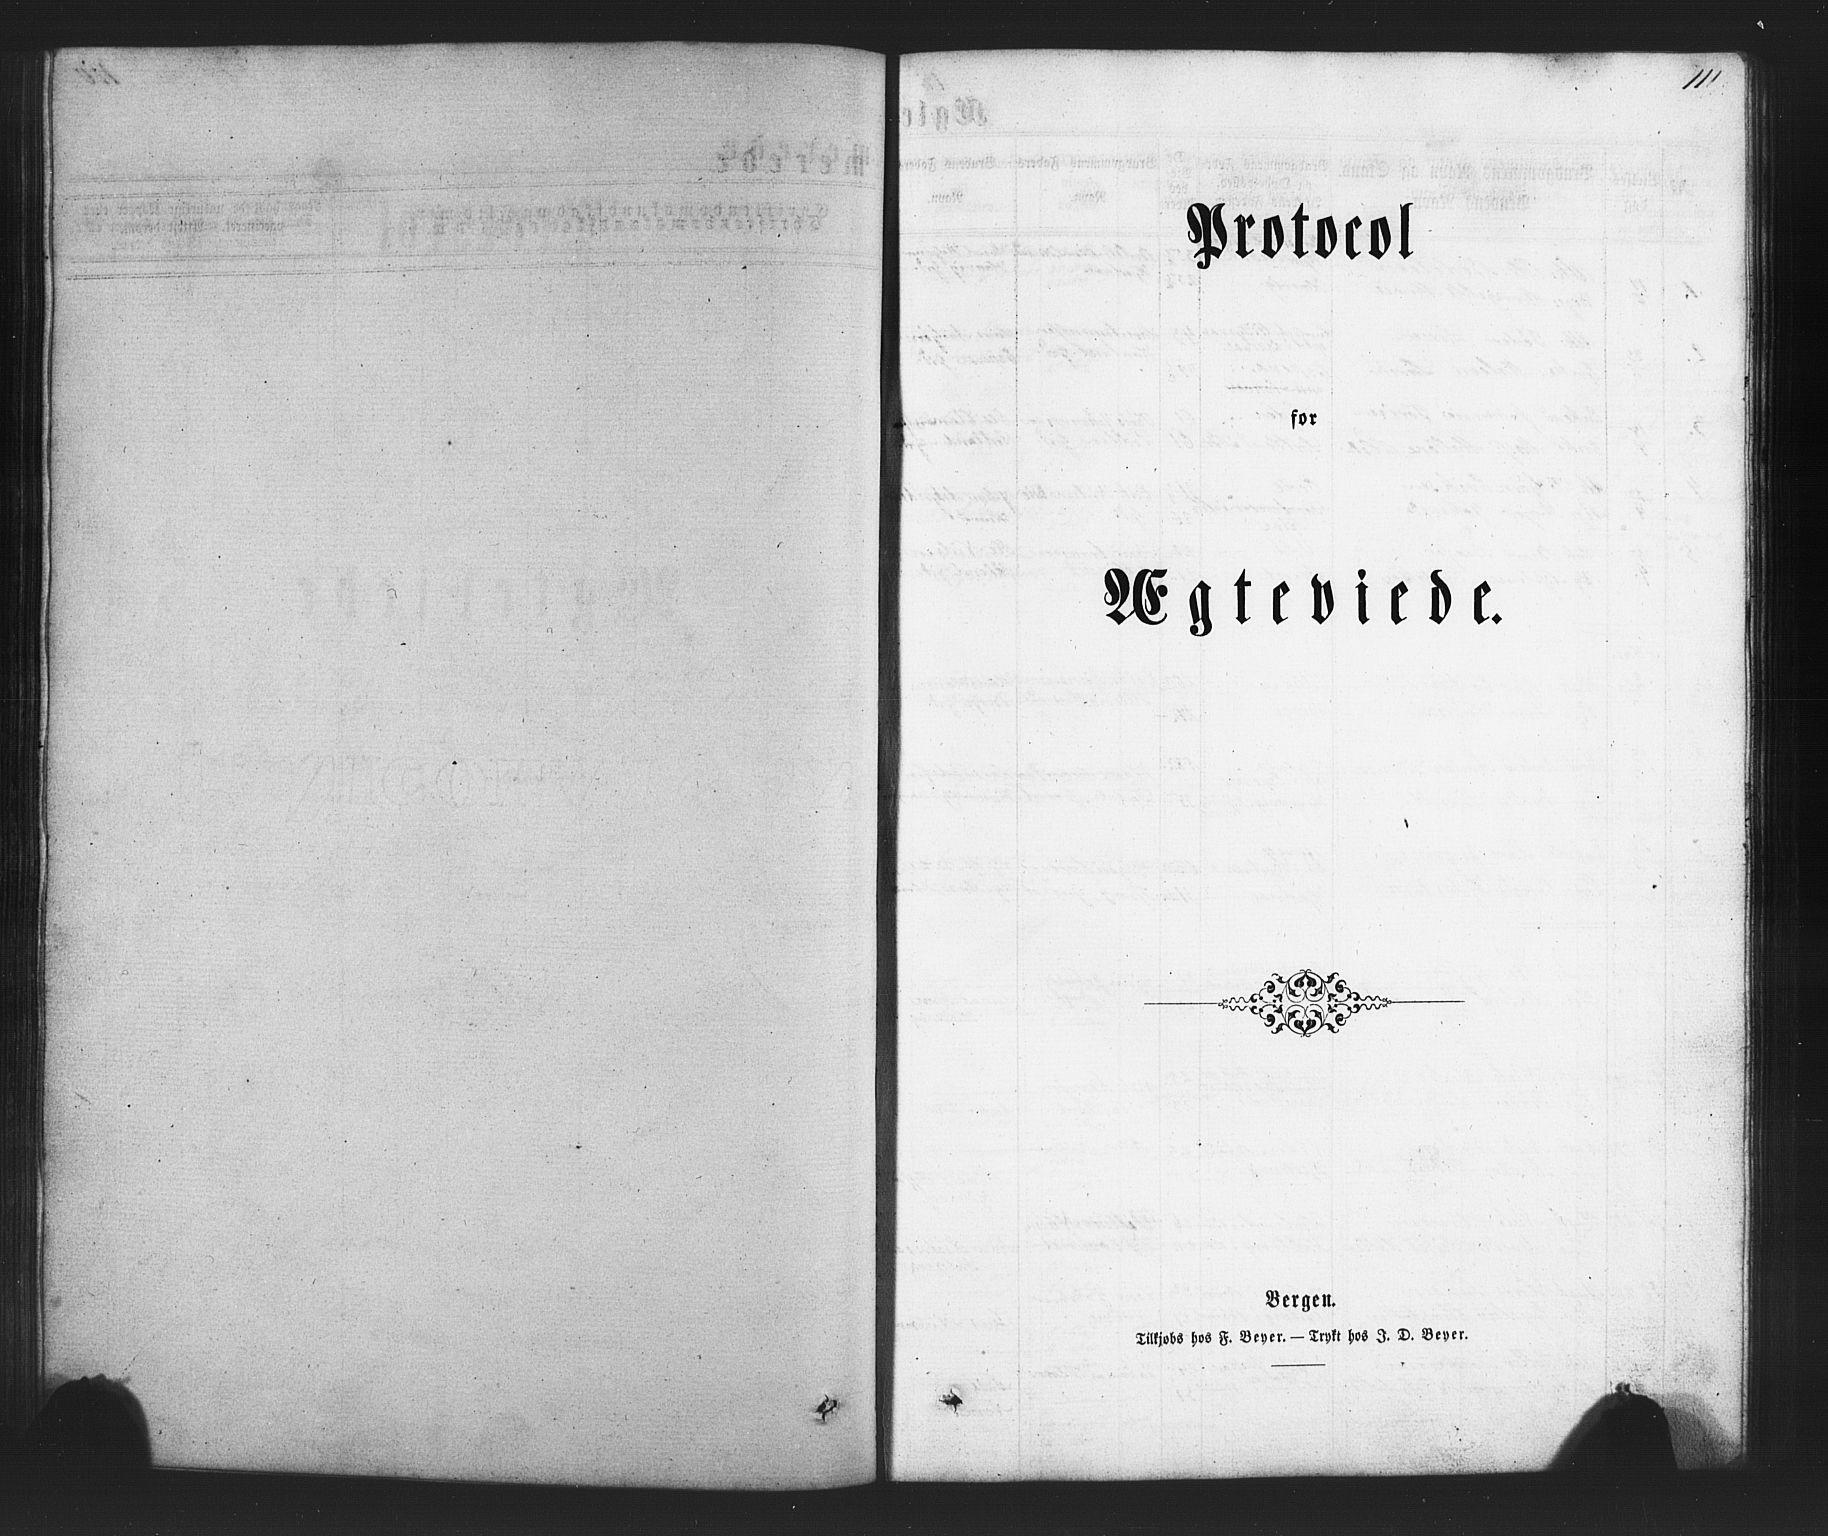 SAB, Finnås sokneprestembete, H/Ha/Hab/Habc/L0001: Klokkerbok nr. C 1, 1860-1887, s. 111